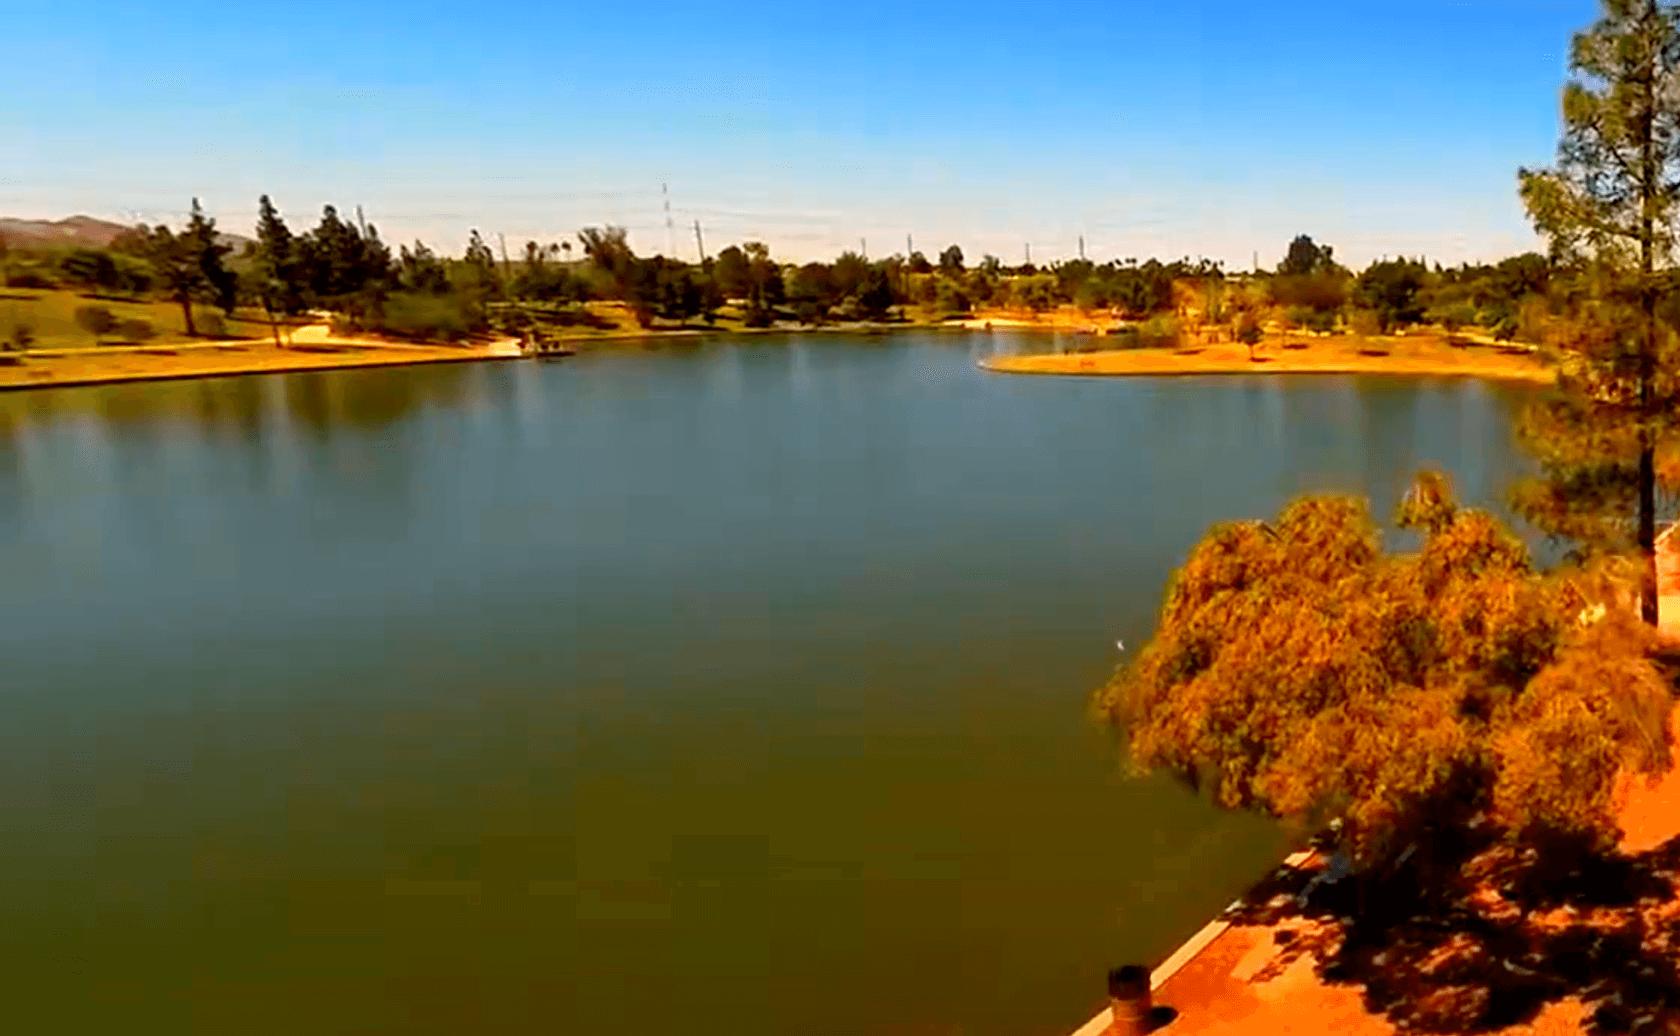 Kiwanis-Lake-Fishing-Guide-Tempe-AZ-03